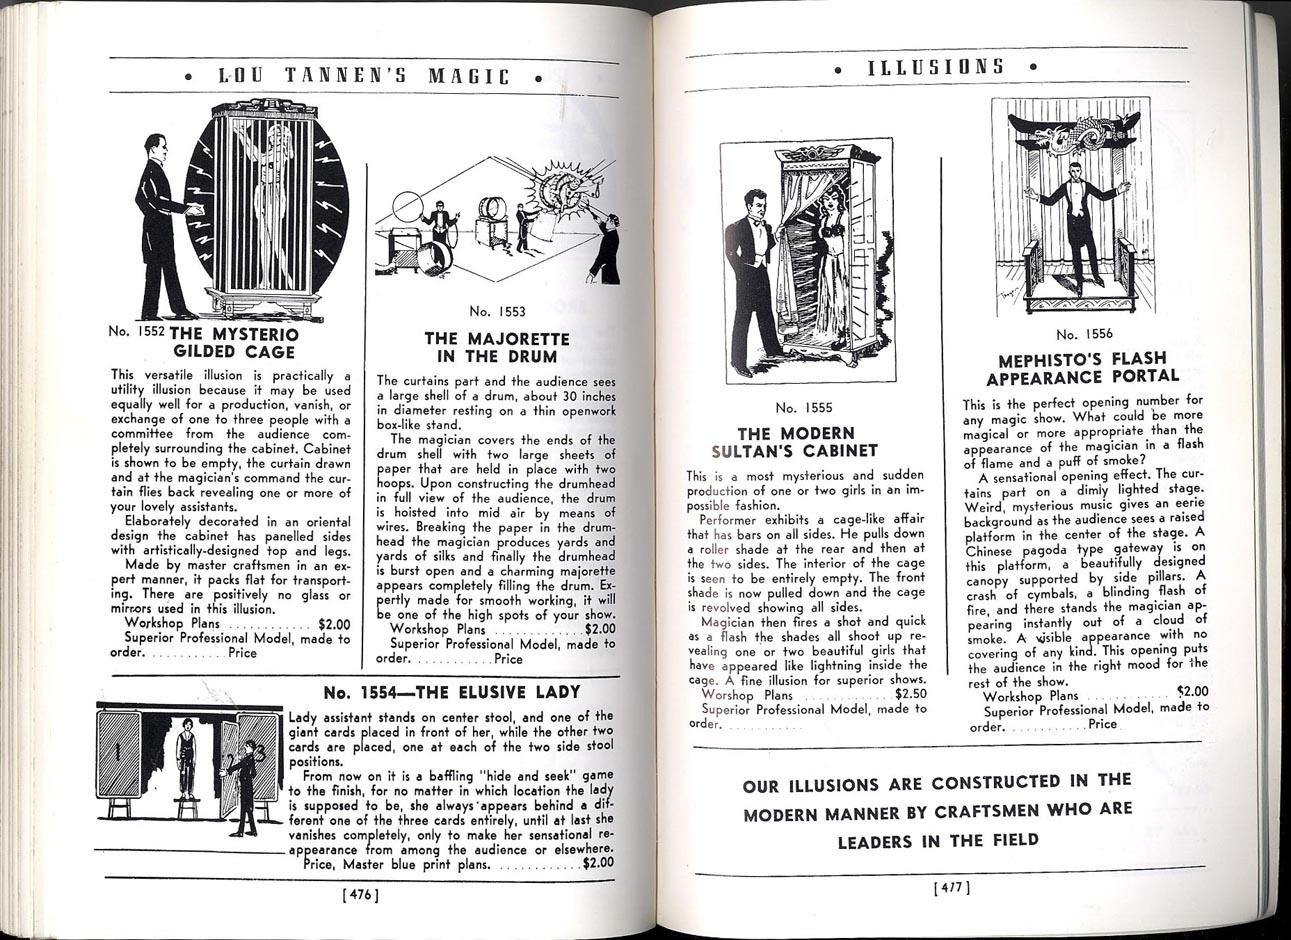 magic tricks and apparatus louis tannen 39 s catalogue. Black Bedroom Furniture Sets. Home Design Ideas